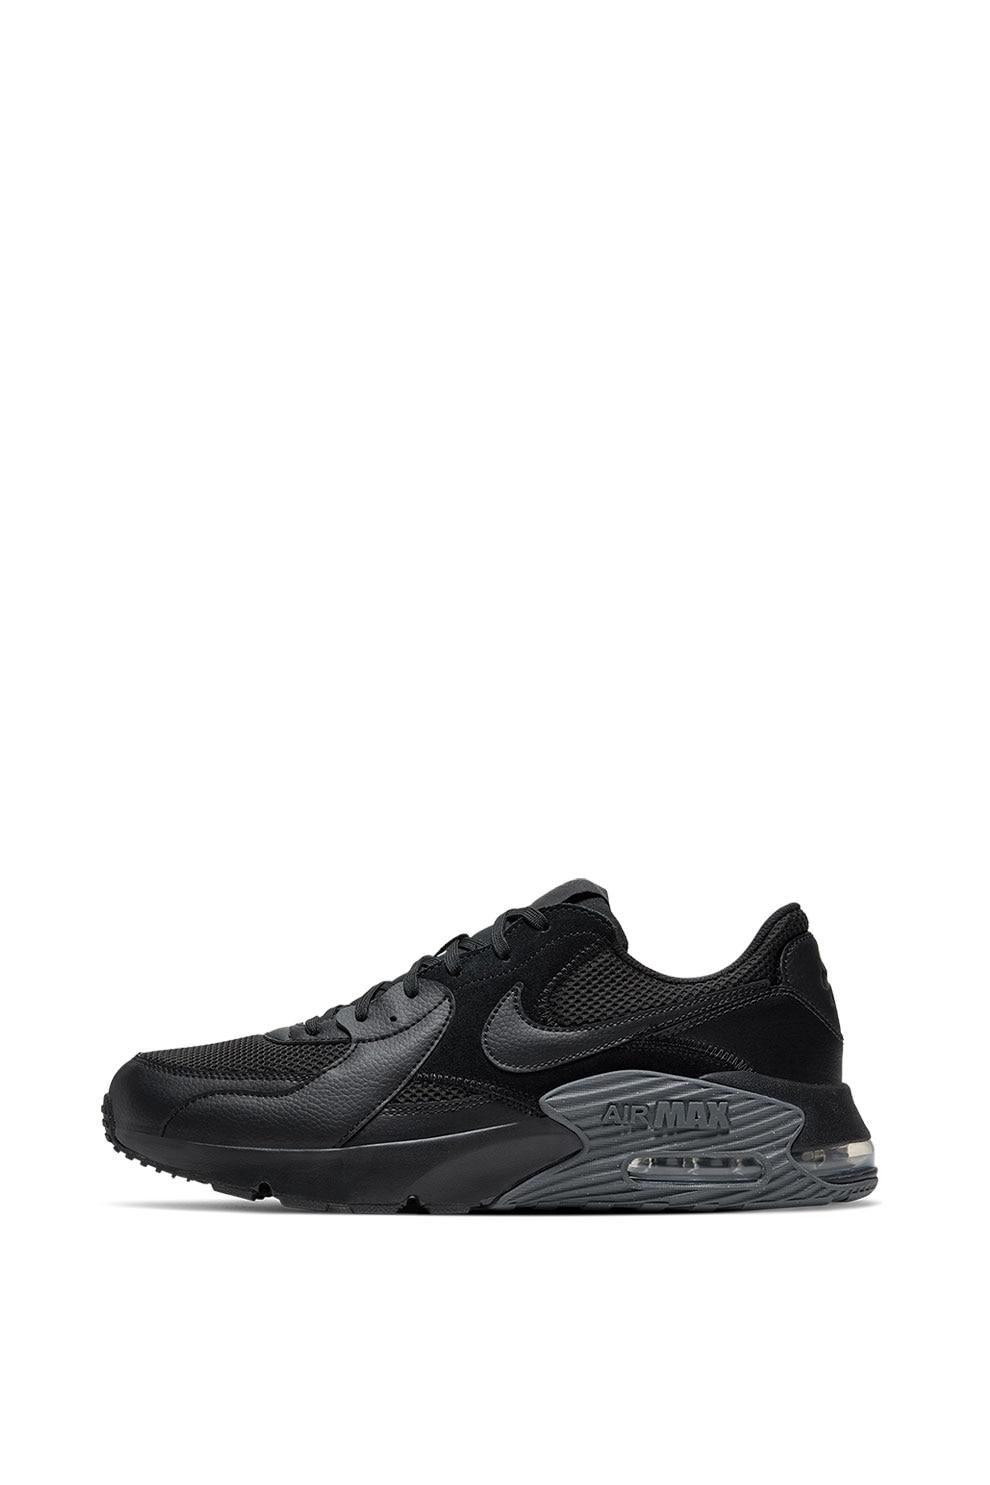 Reclamación subasta Monopolio  Nike, Pantofi sport cu garnituri din piele intoarsa Air Max Excee, Negru, 8  - eMAG.ro